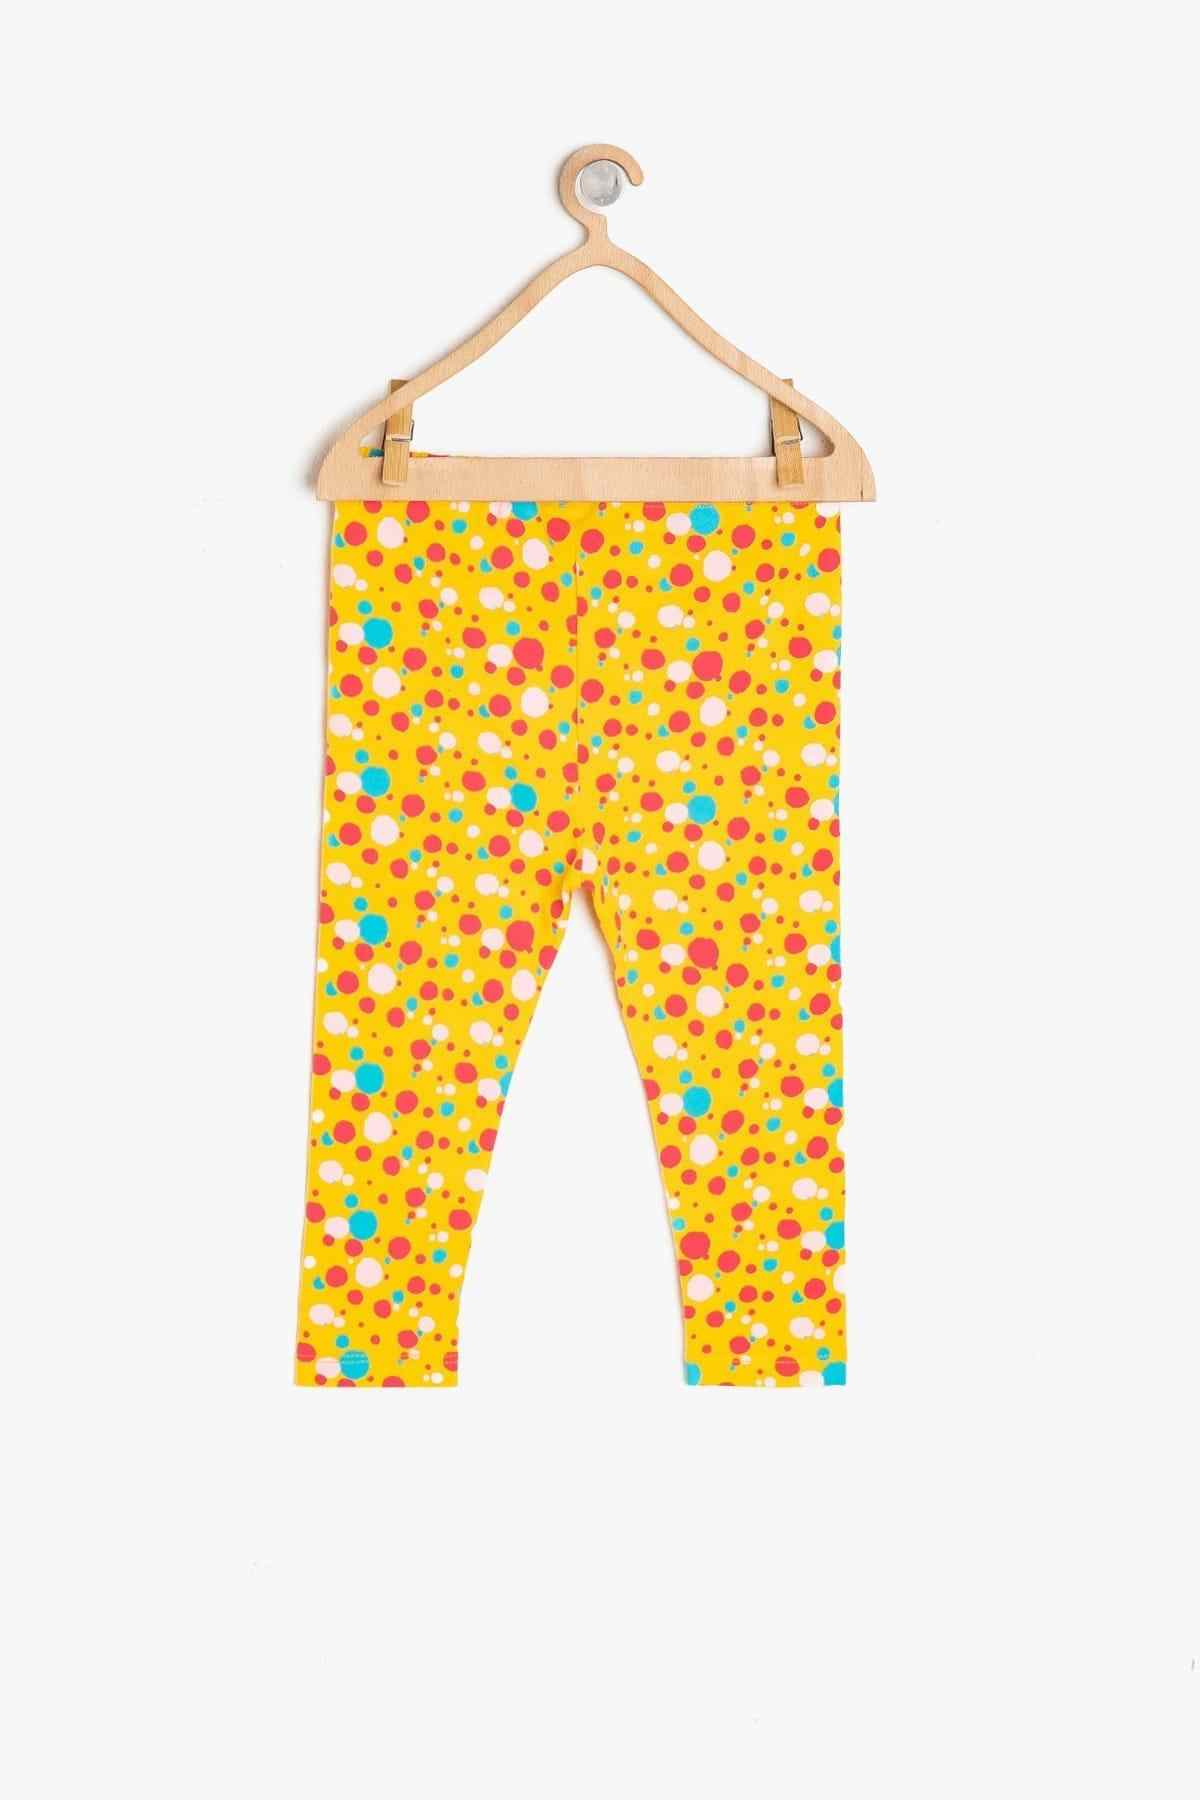 Koton Kids Yellow Baby Girl Patterned Leggings Tights Aliexpress